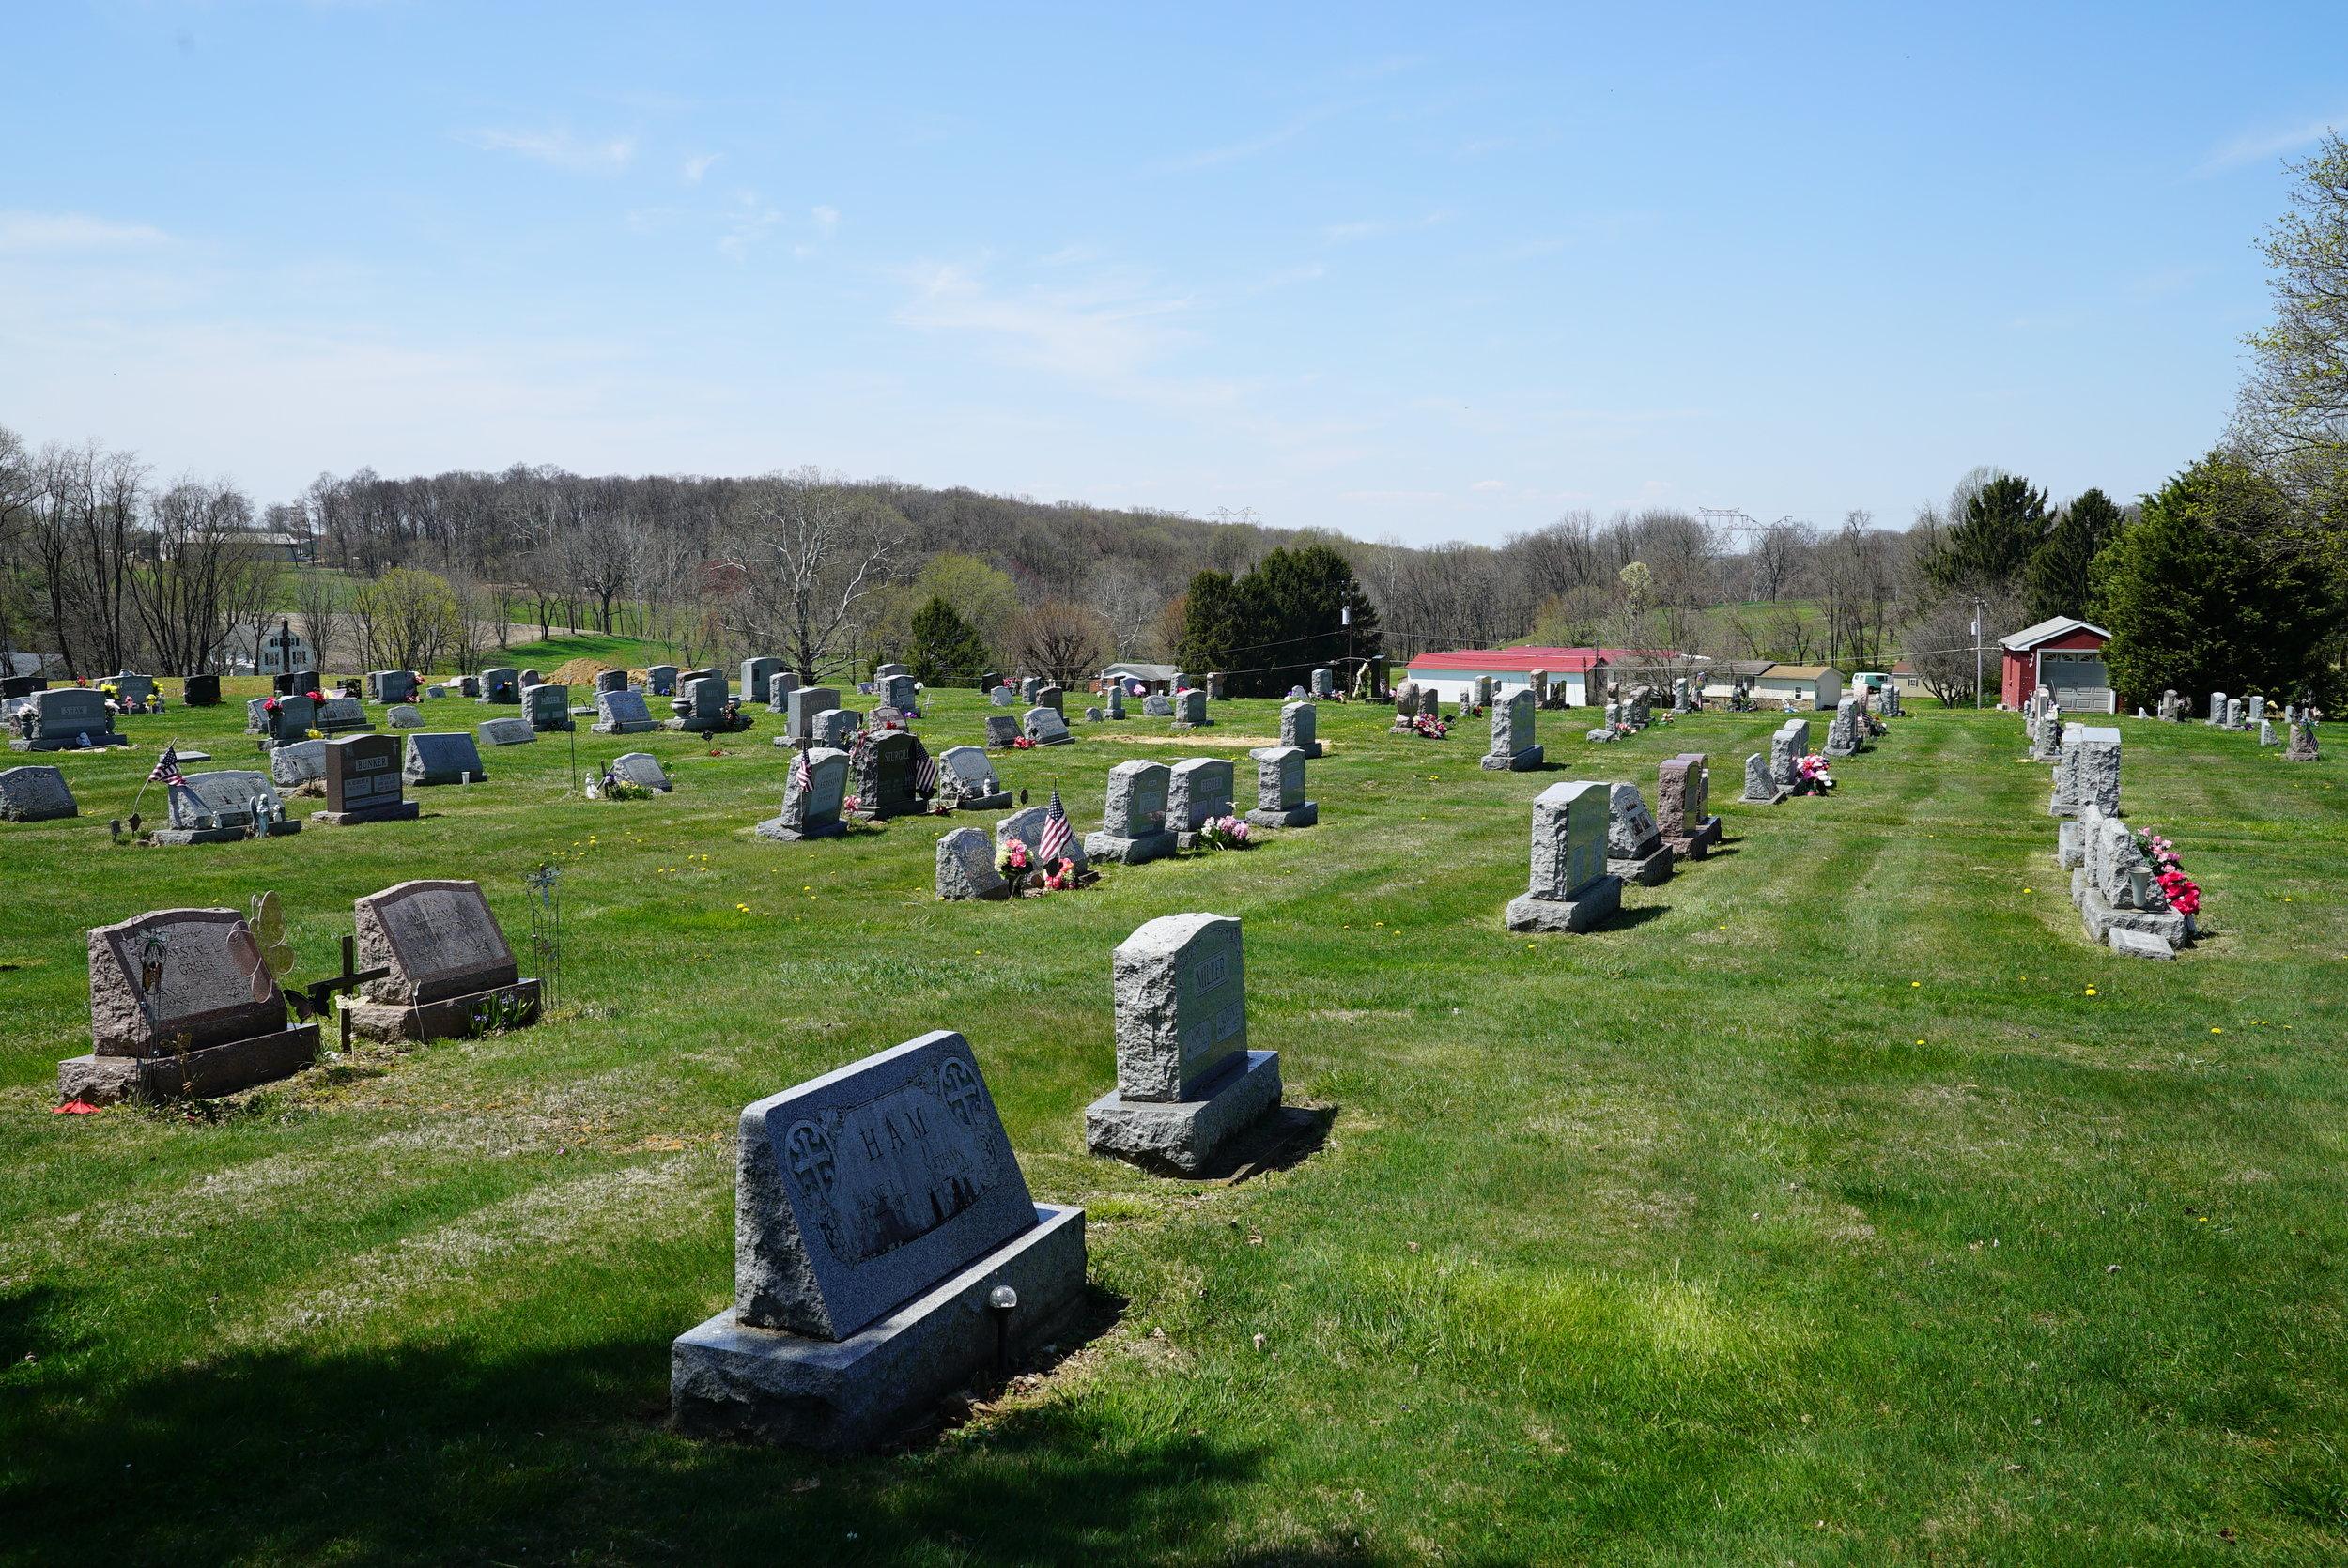 Nottingham Missionary Baptist Church Cemetery. Nottingham, Pnnsylvania.